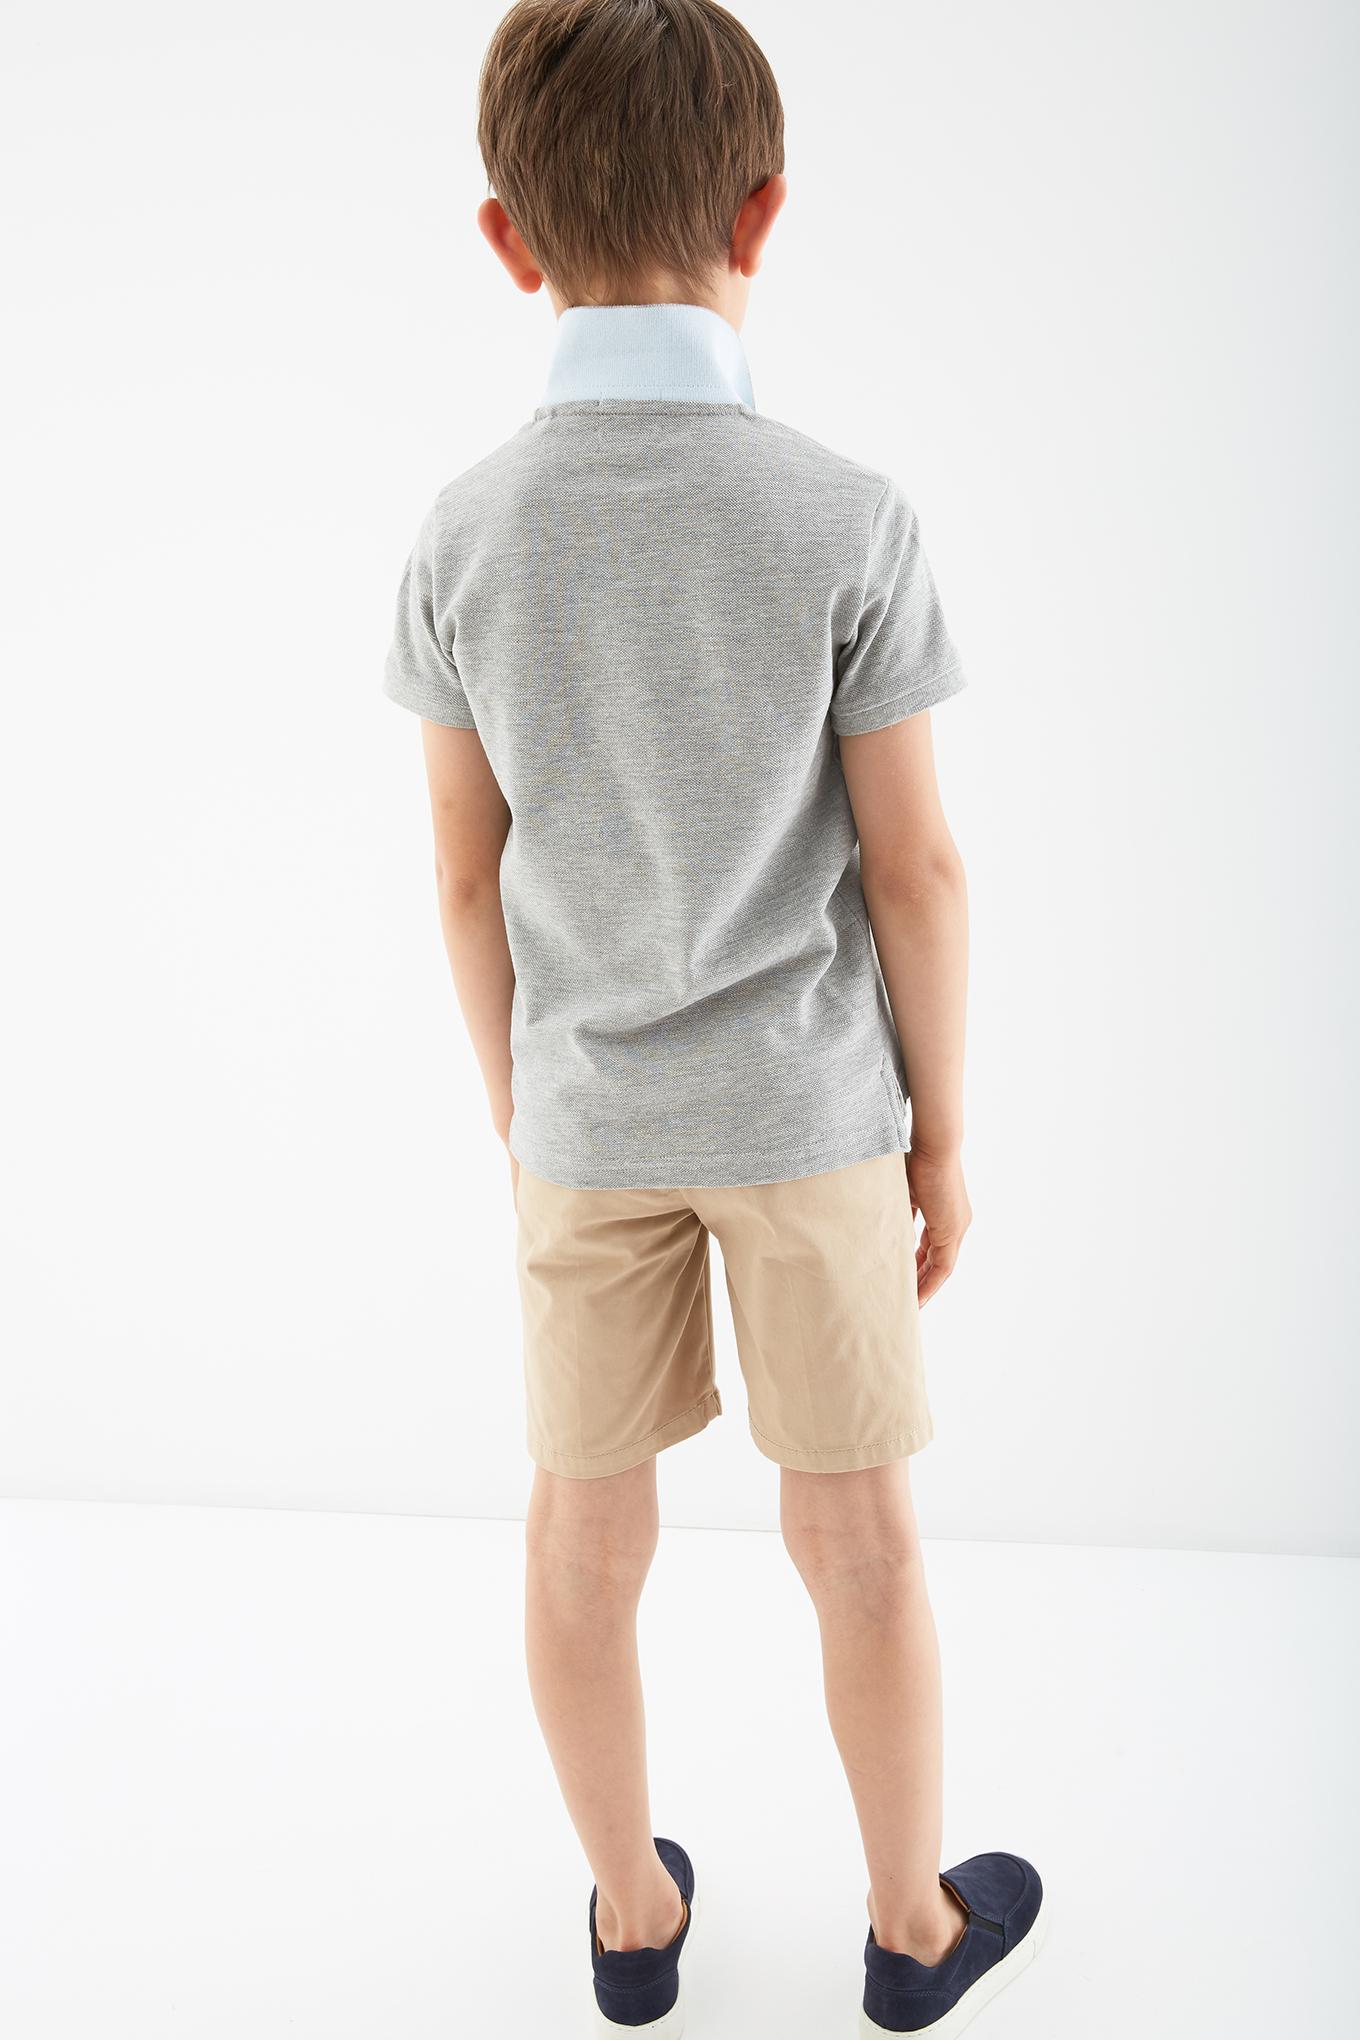 Bermuda Beige Casual Boy